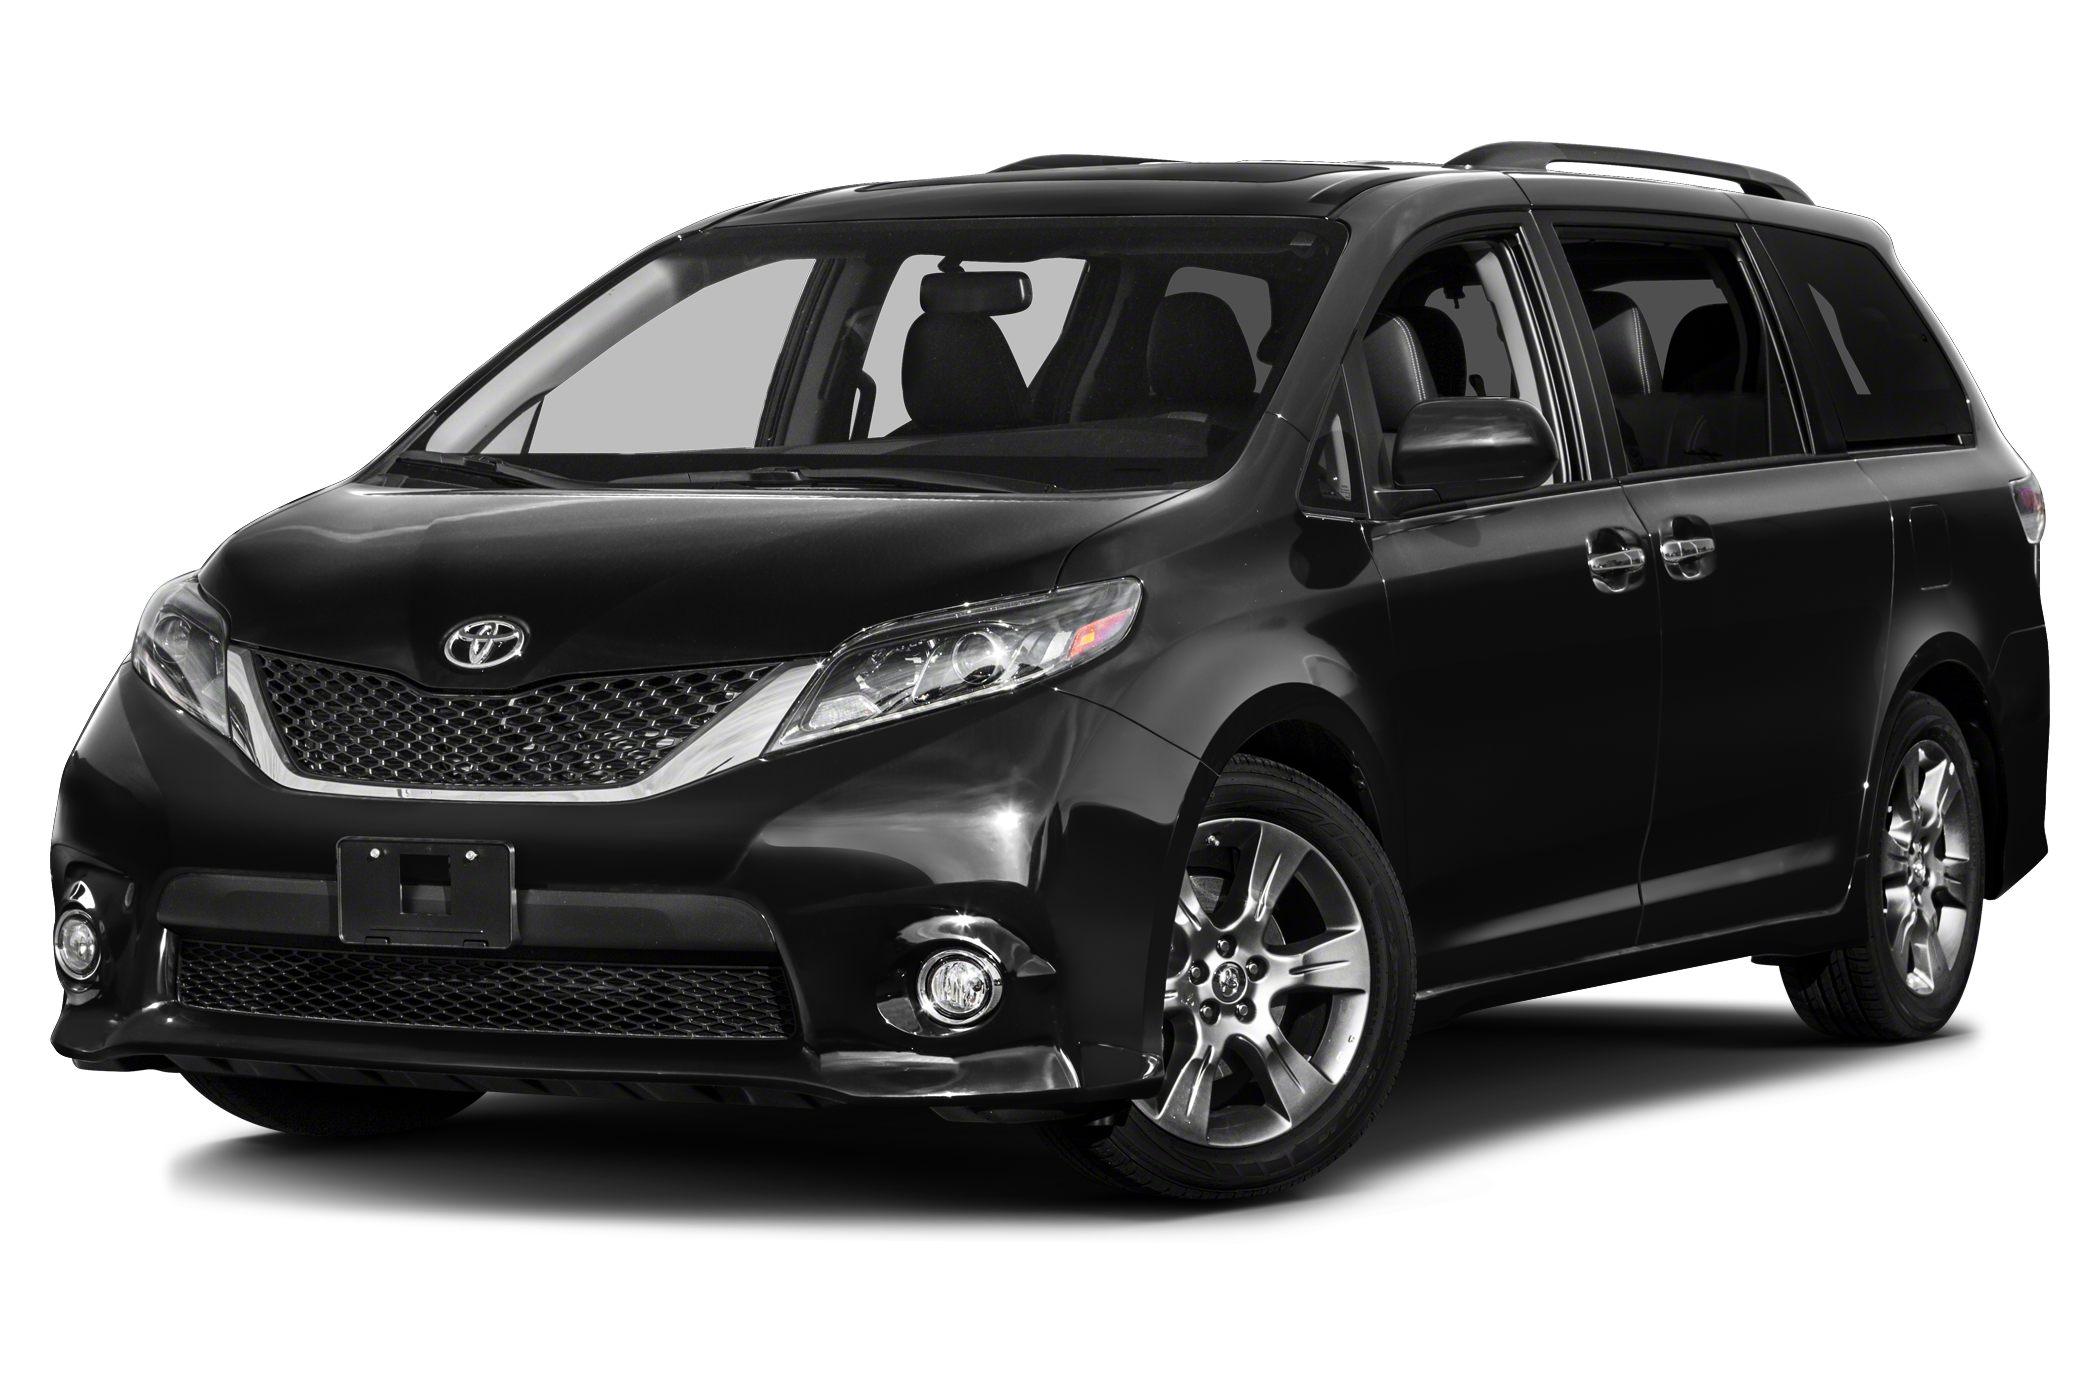 2017 Toyota Sienna SE 8 Passenger Third Row Seat Heated Leather Seats CD Player Bluetooth Rear